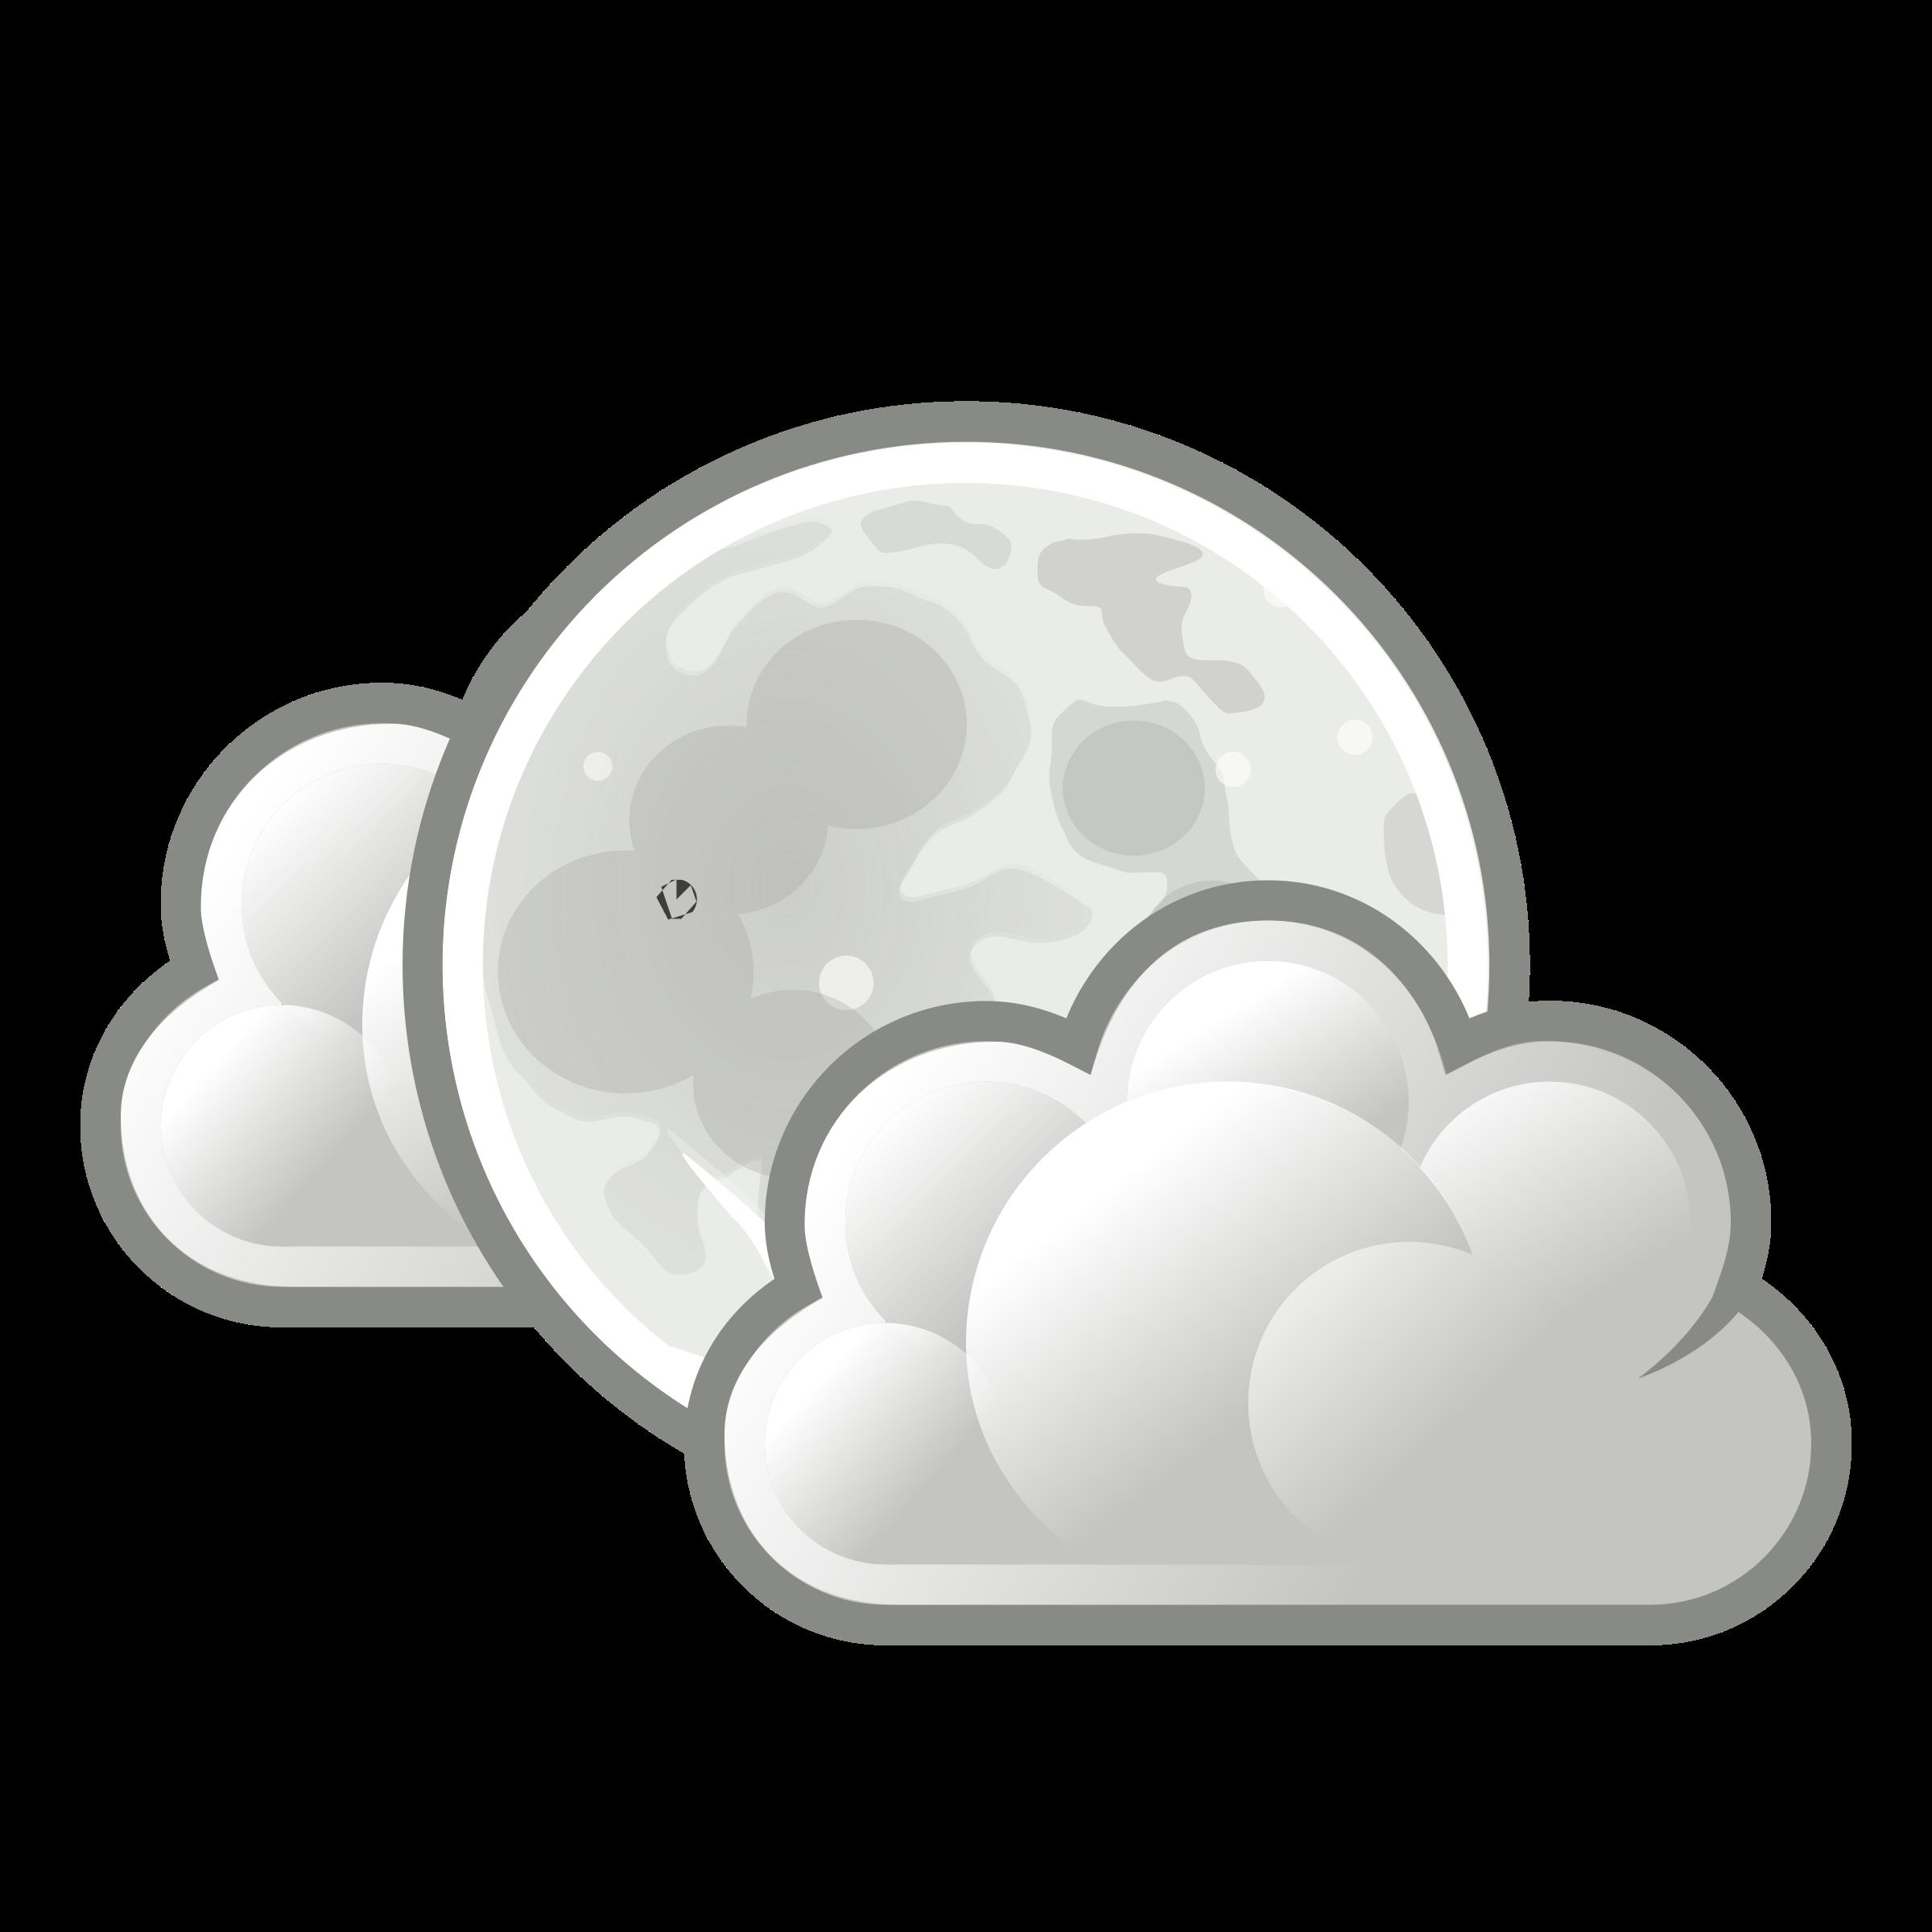 Clouds clipart weather. Tango few night big